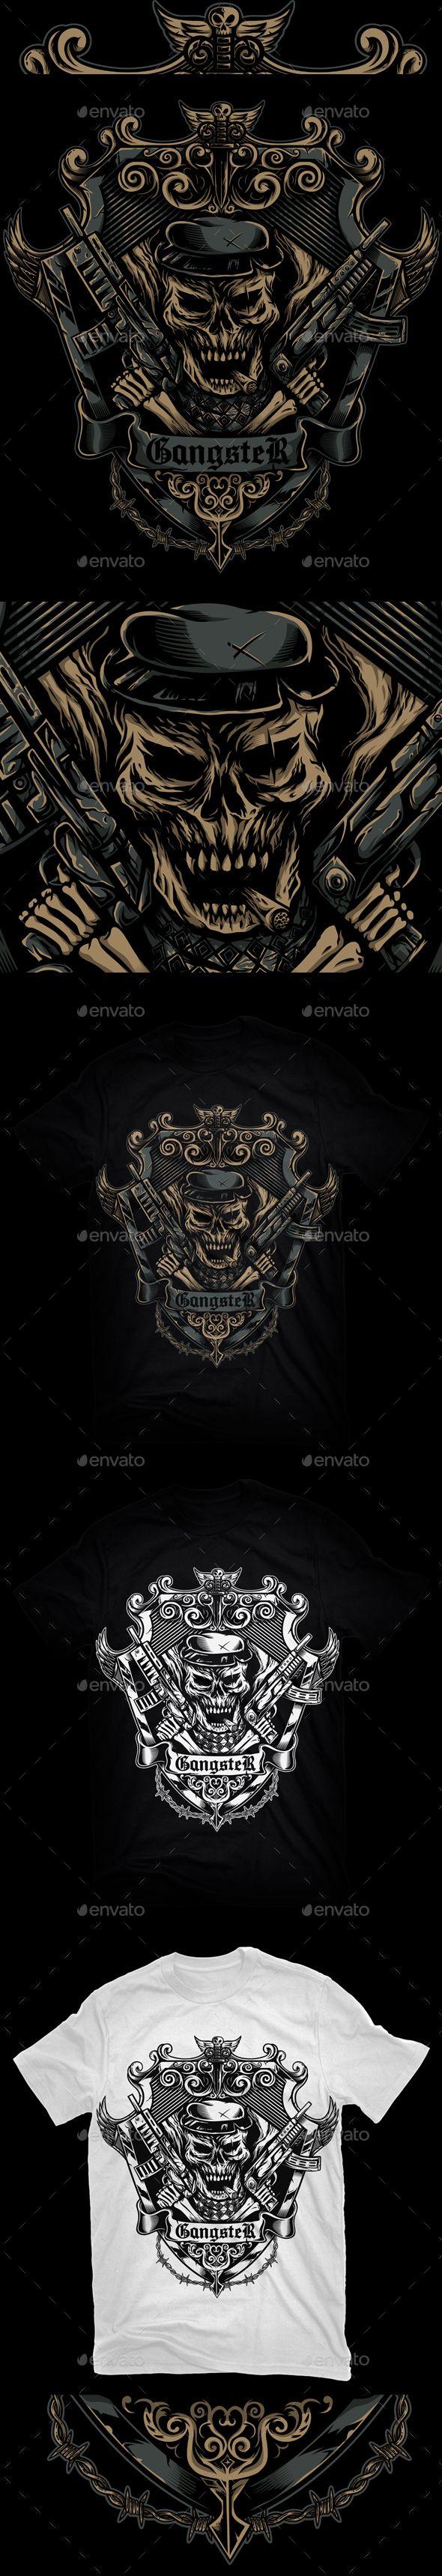 Black t shirt vector ai - Gangster T Shirt Vector Illustration Eps Ai Design Download Http